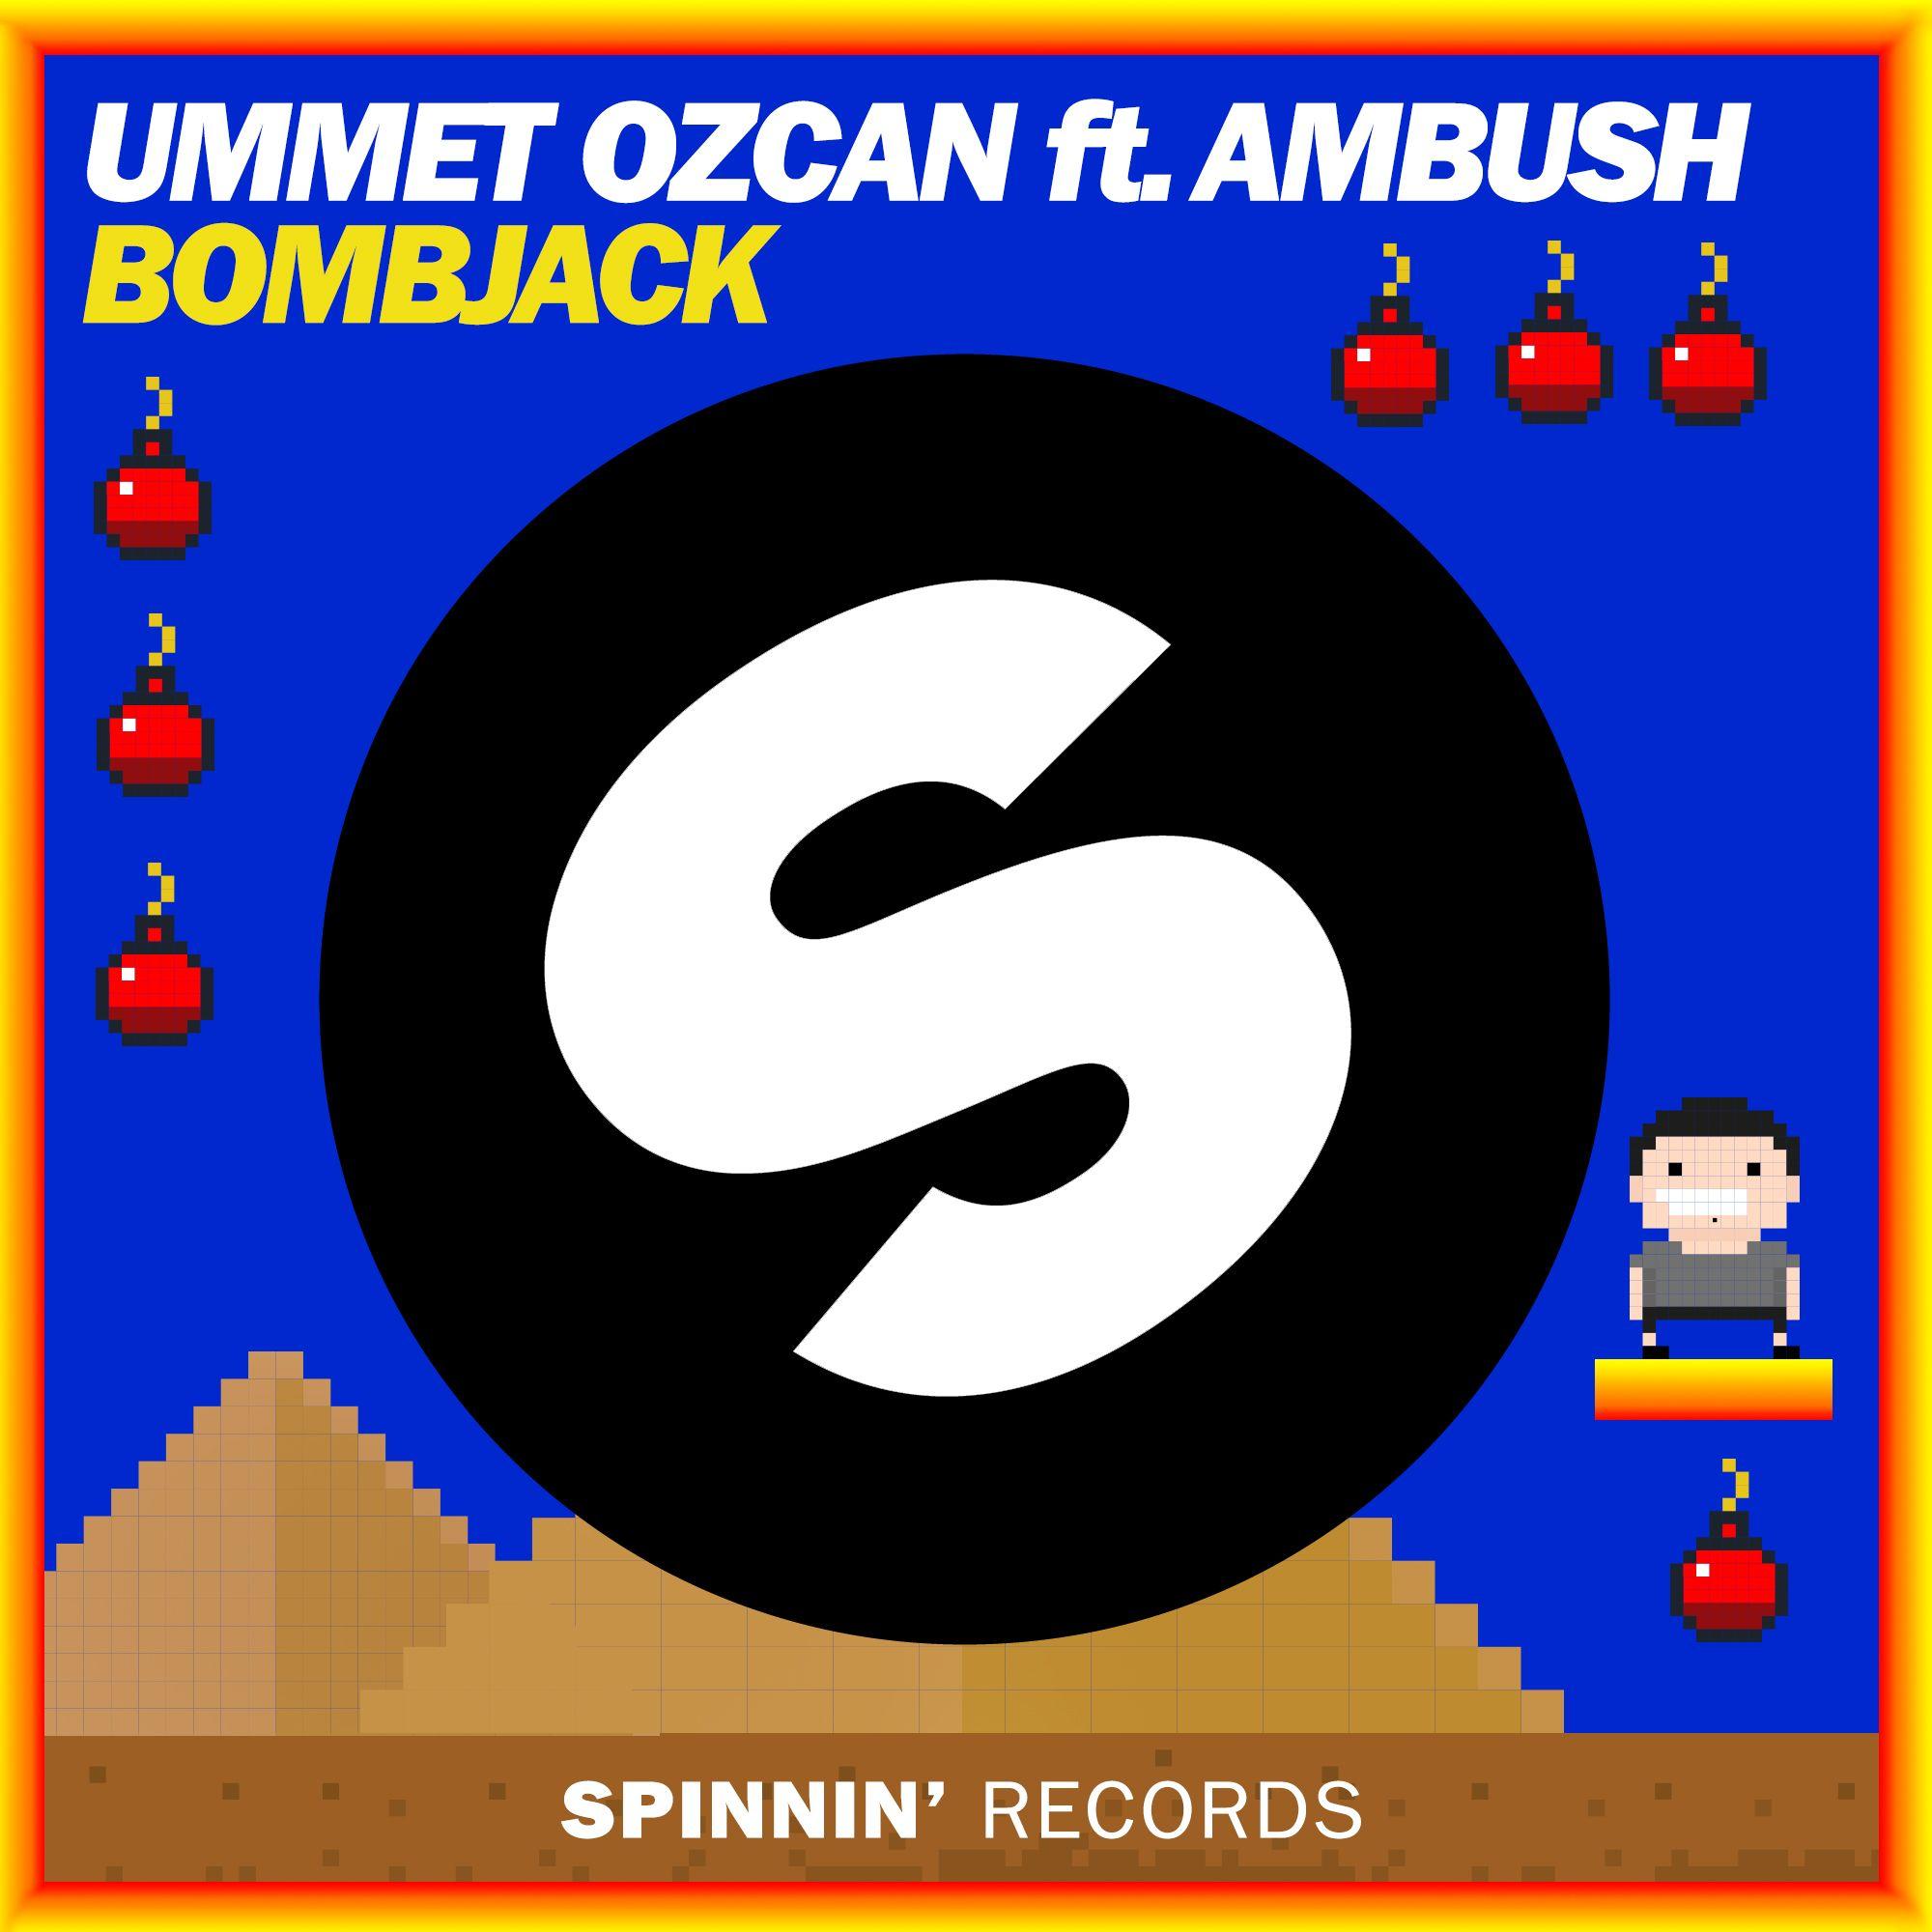 spinnin_ummet_ozcan_ft_ambush_-_bombjack.jpg